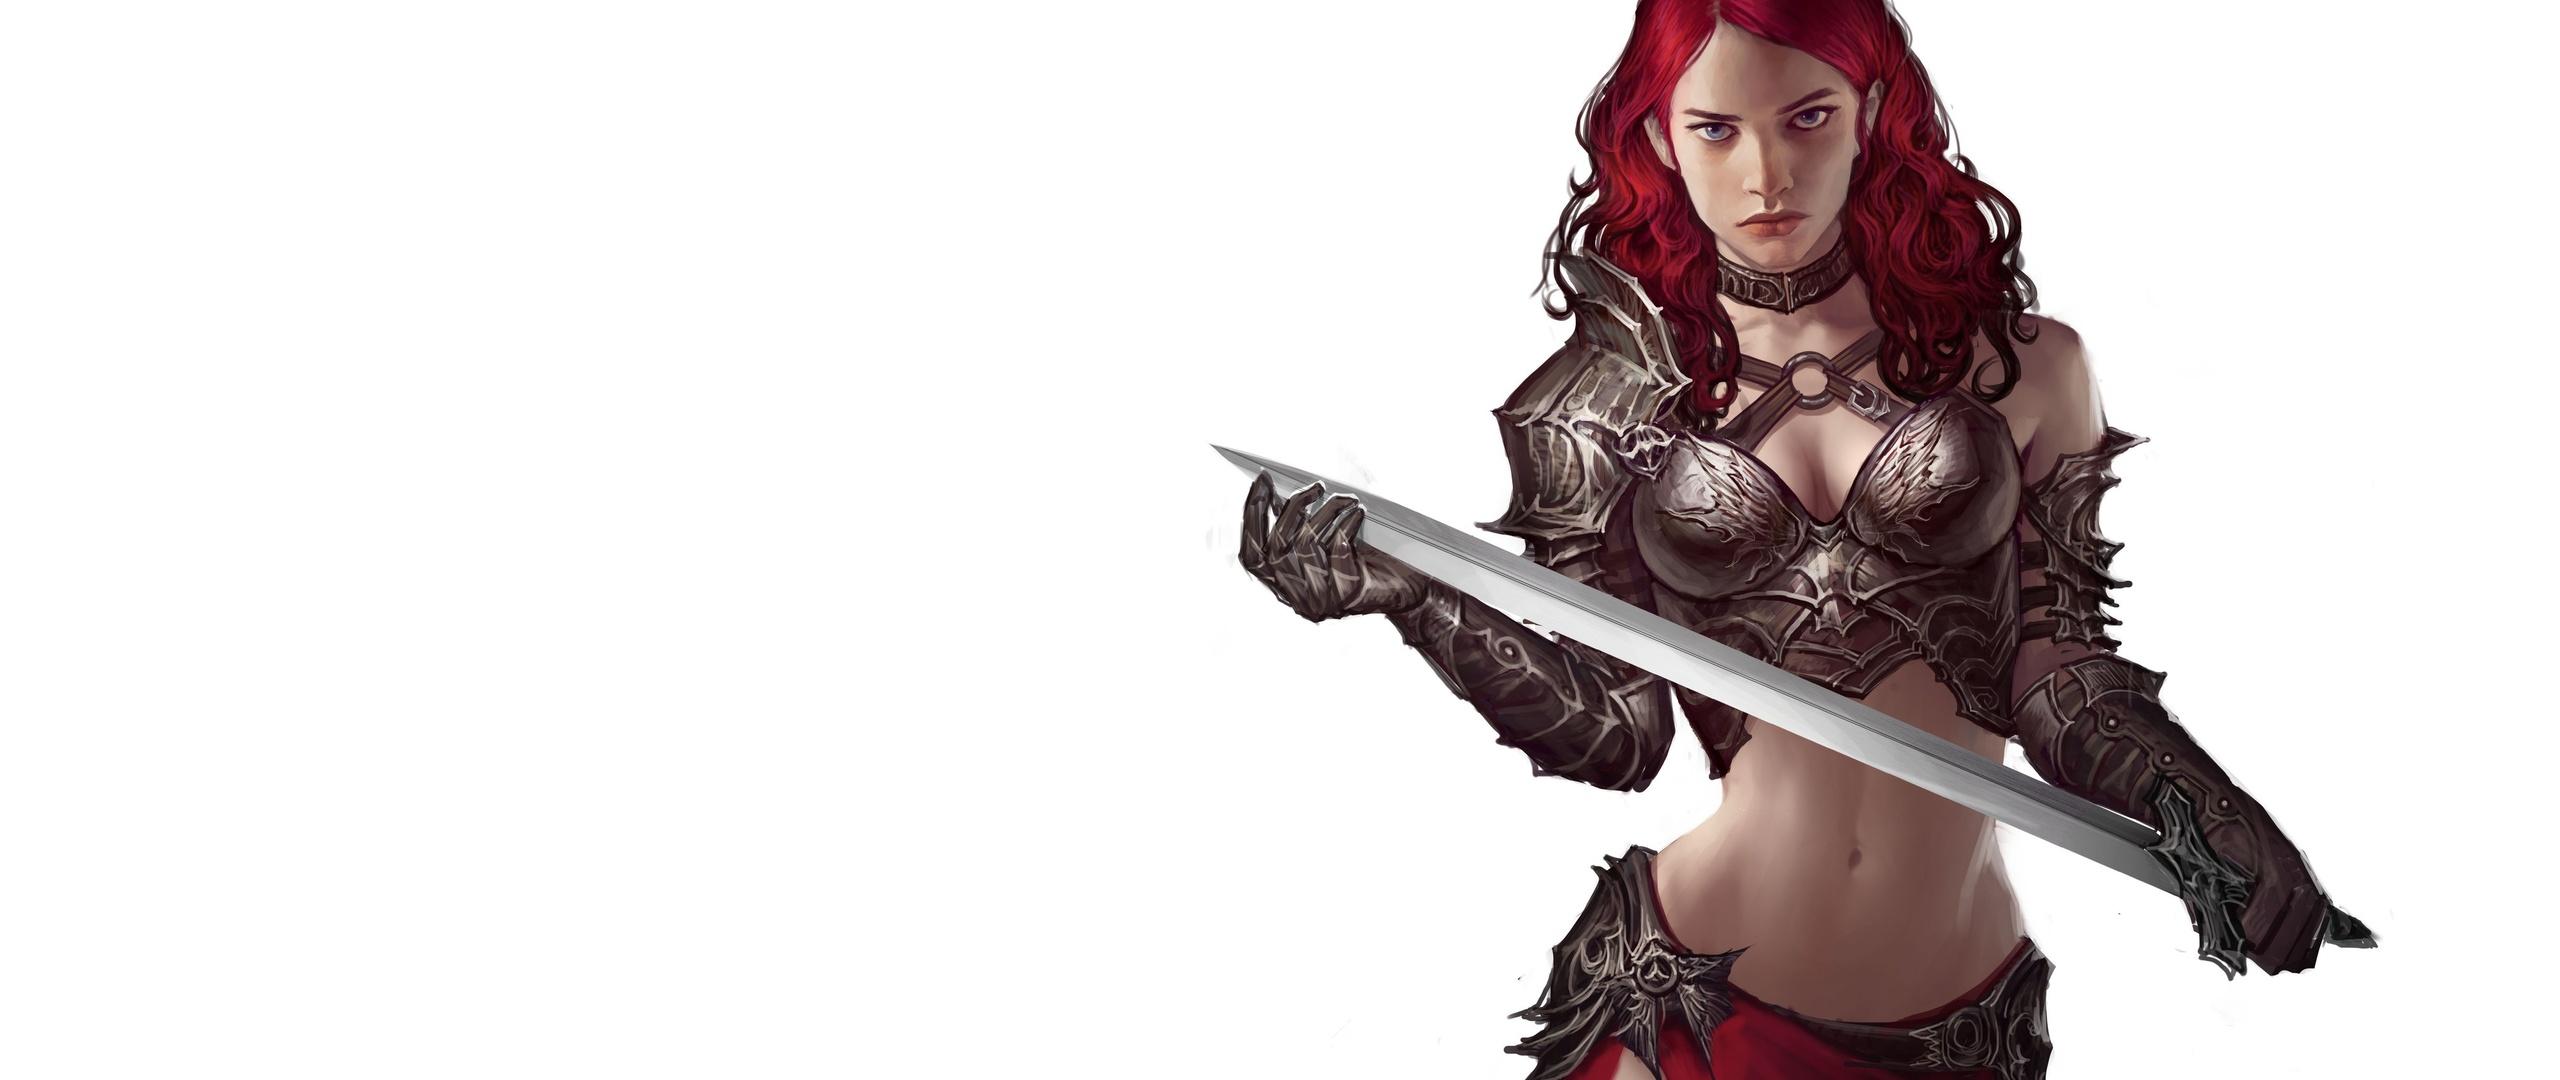 fantasy-warrior-woman-4k-70.jpg